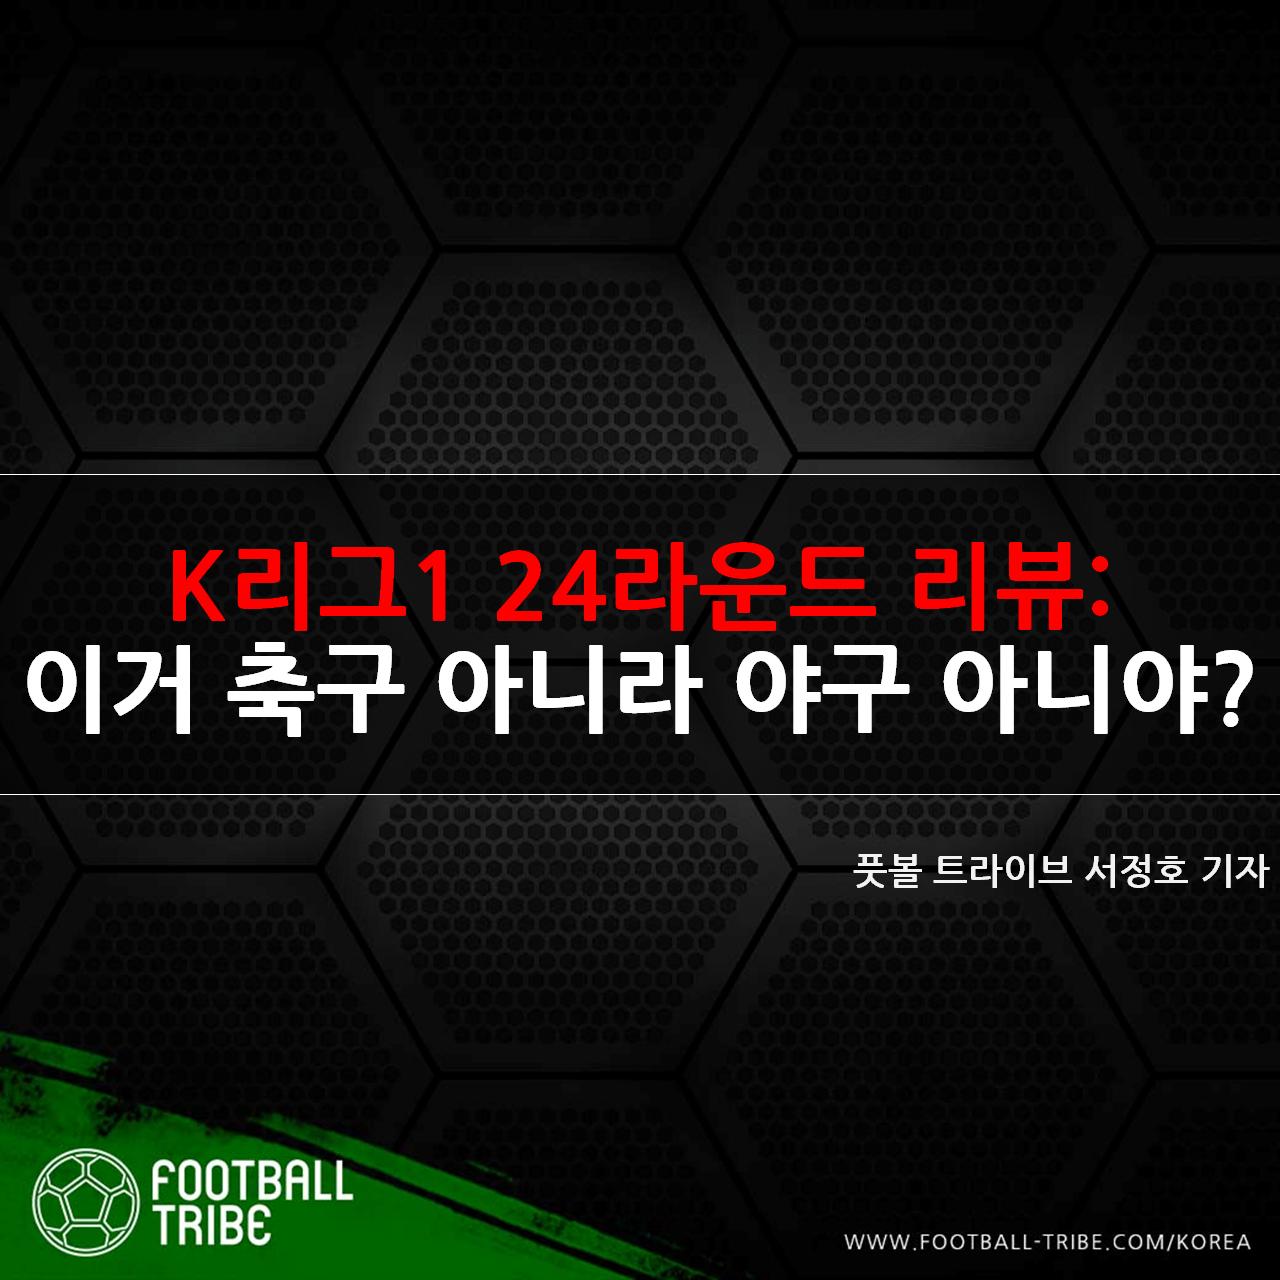 [K리그1 24라운드 리뷰] 이거 축구 아니라 야구 아니야?